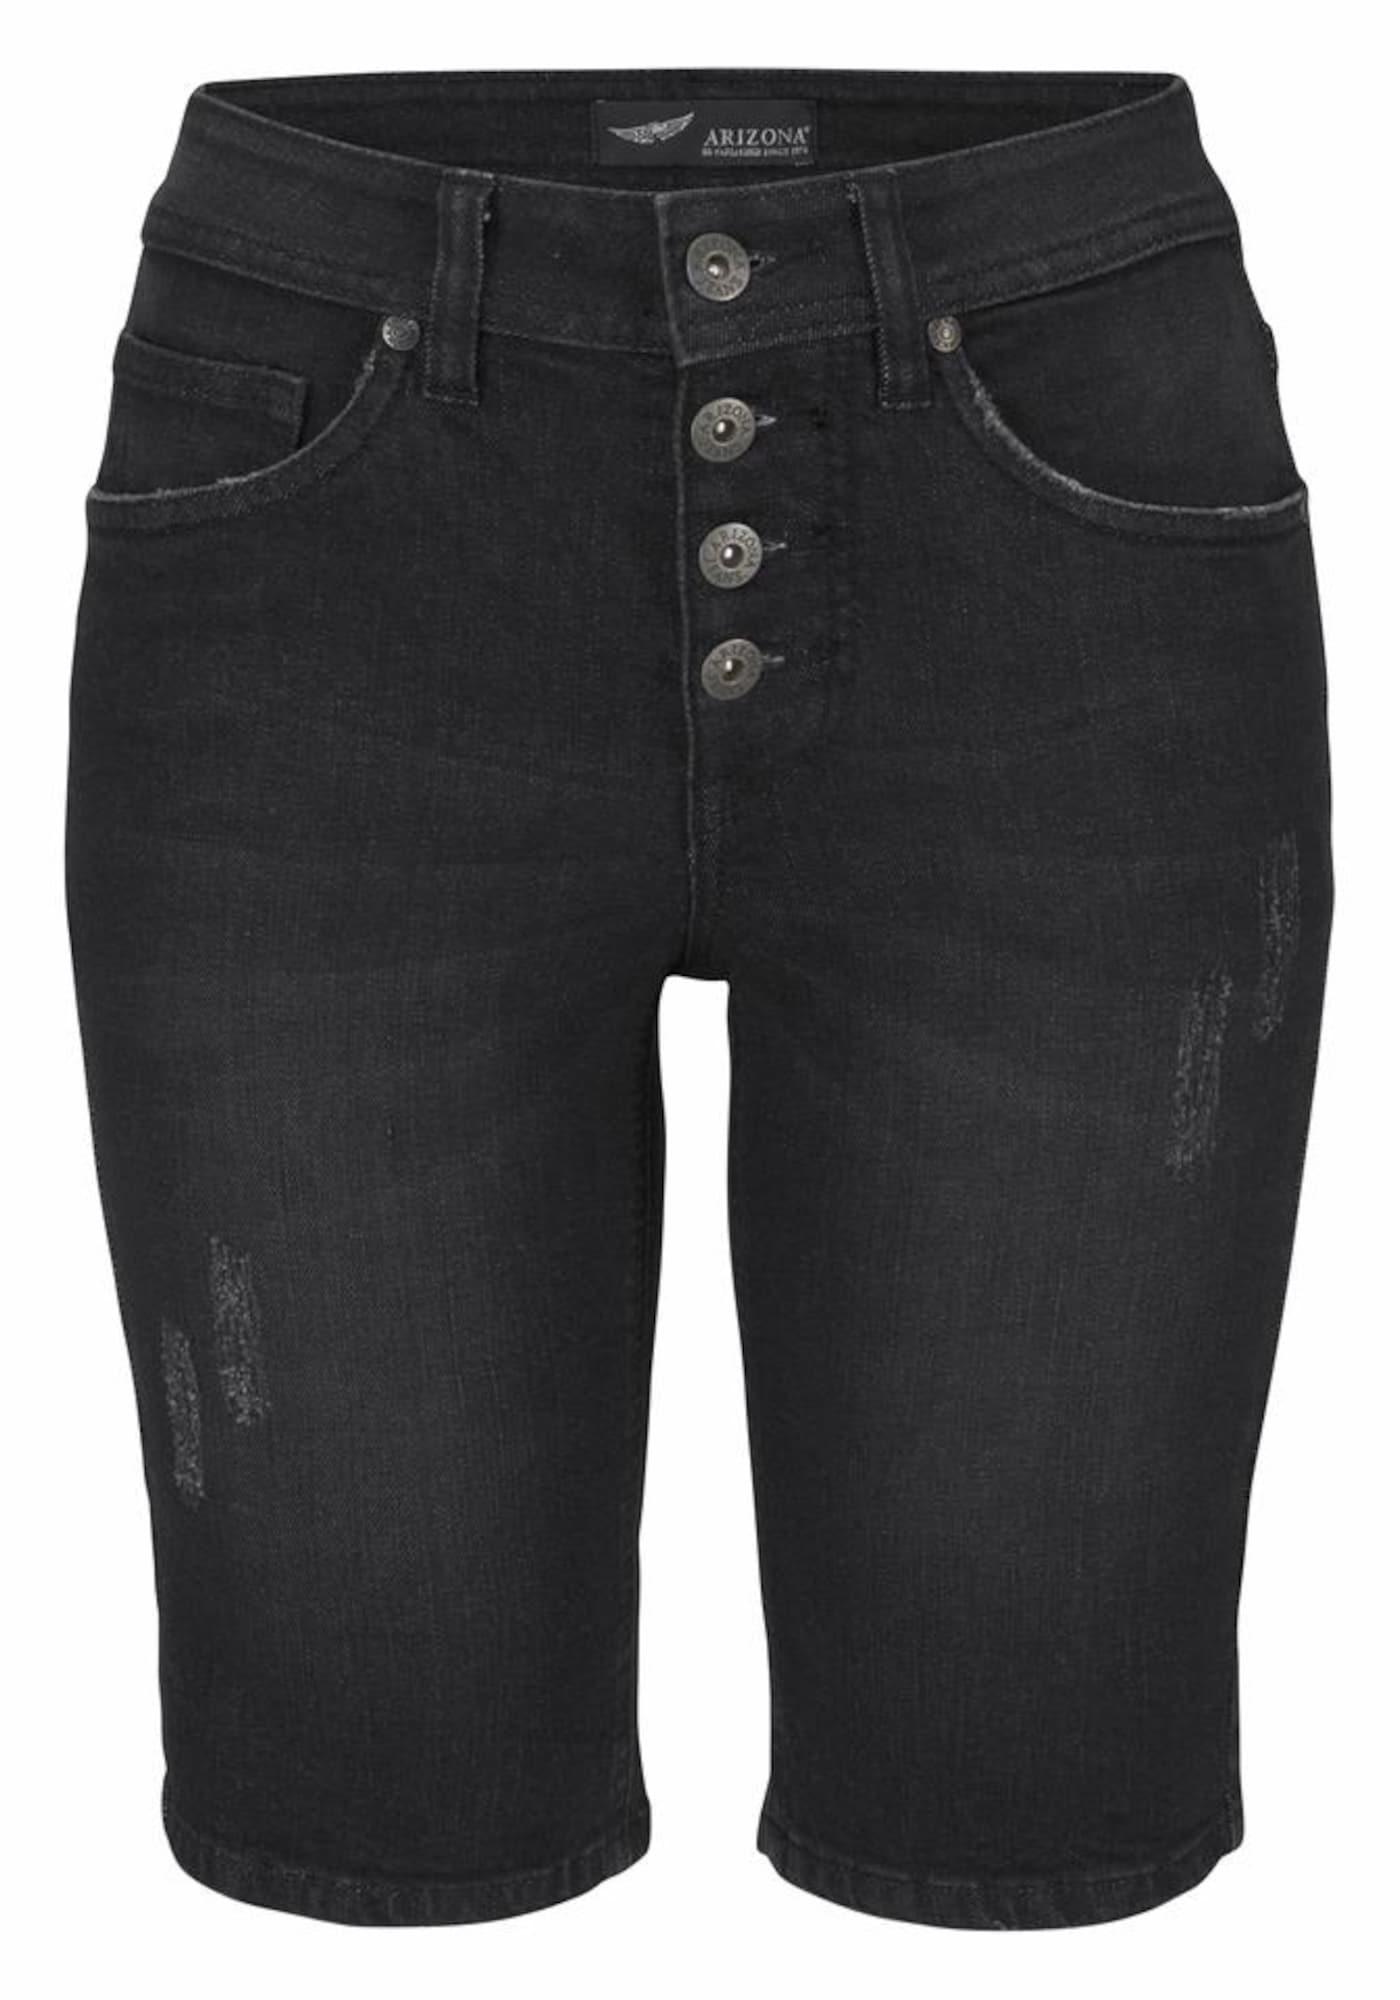 Jeansbermudas | Bekleidung > Jeans > Shorts & Bermudas | Schwarz | ARIZONA